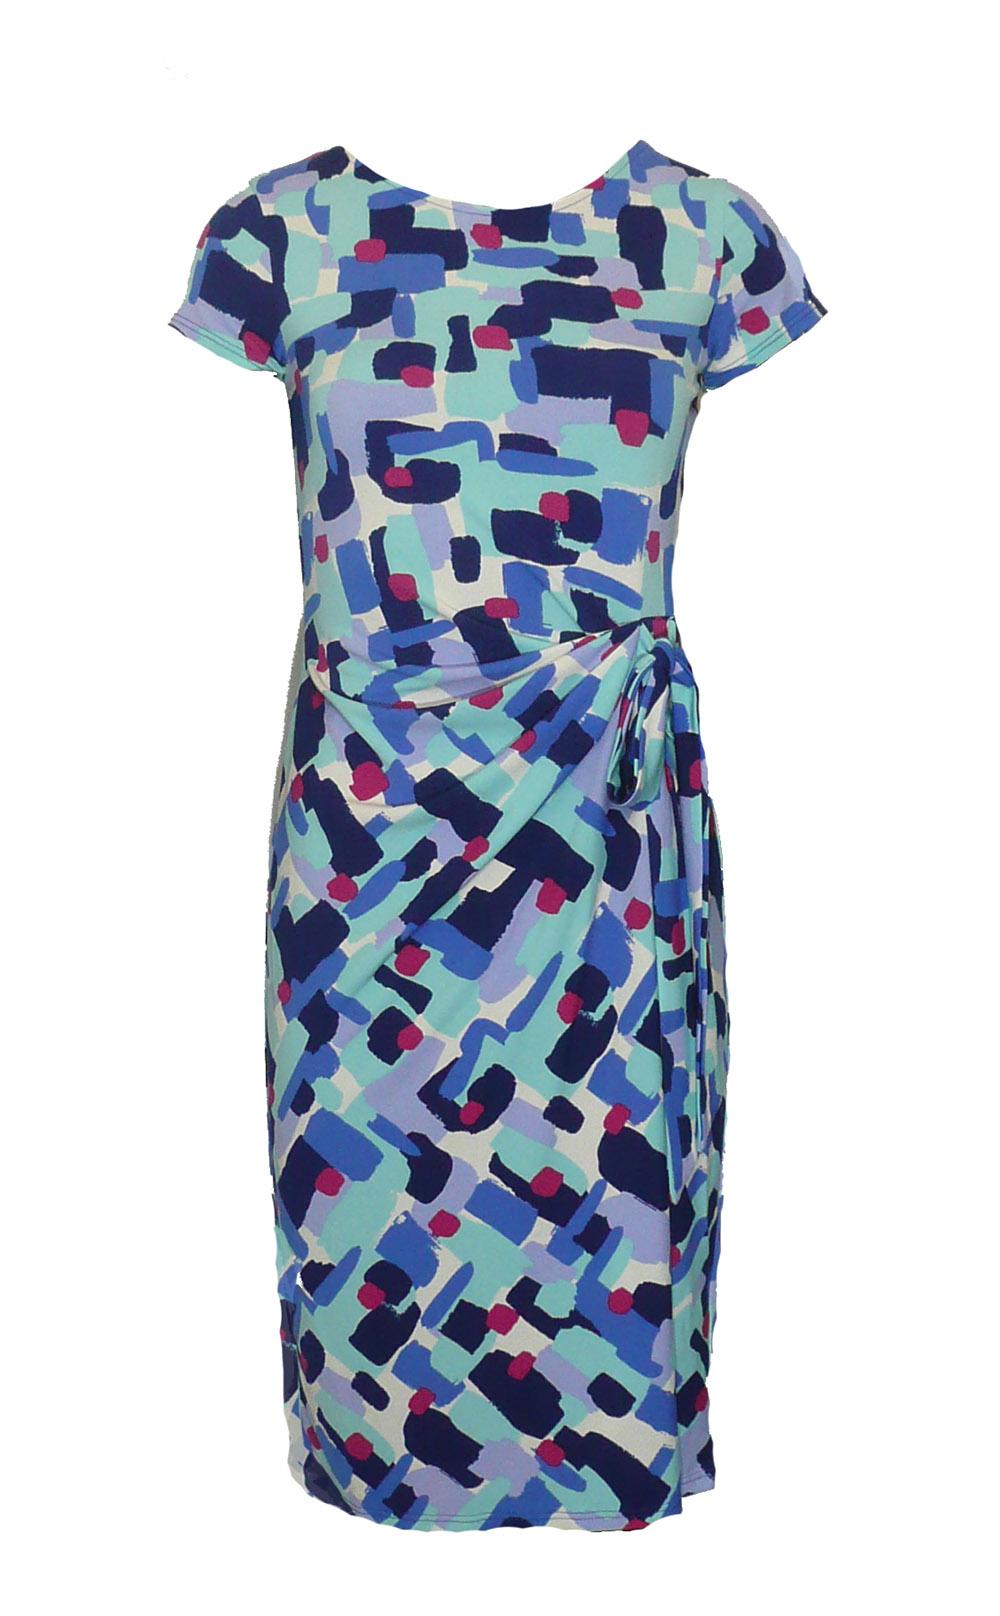 dress leota cap blue prnt.jpg